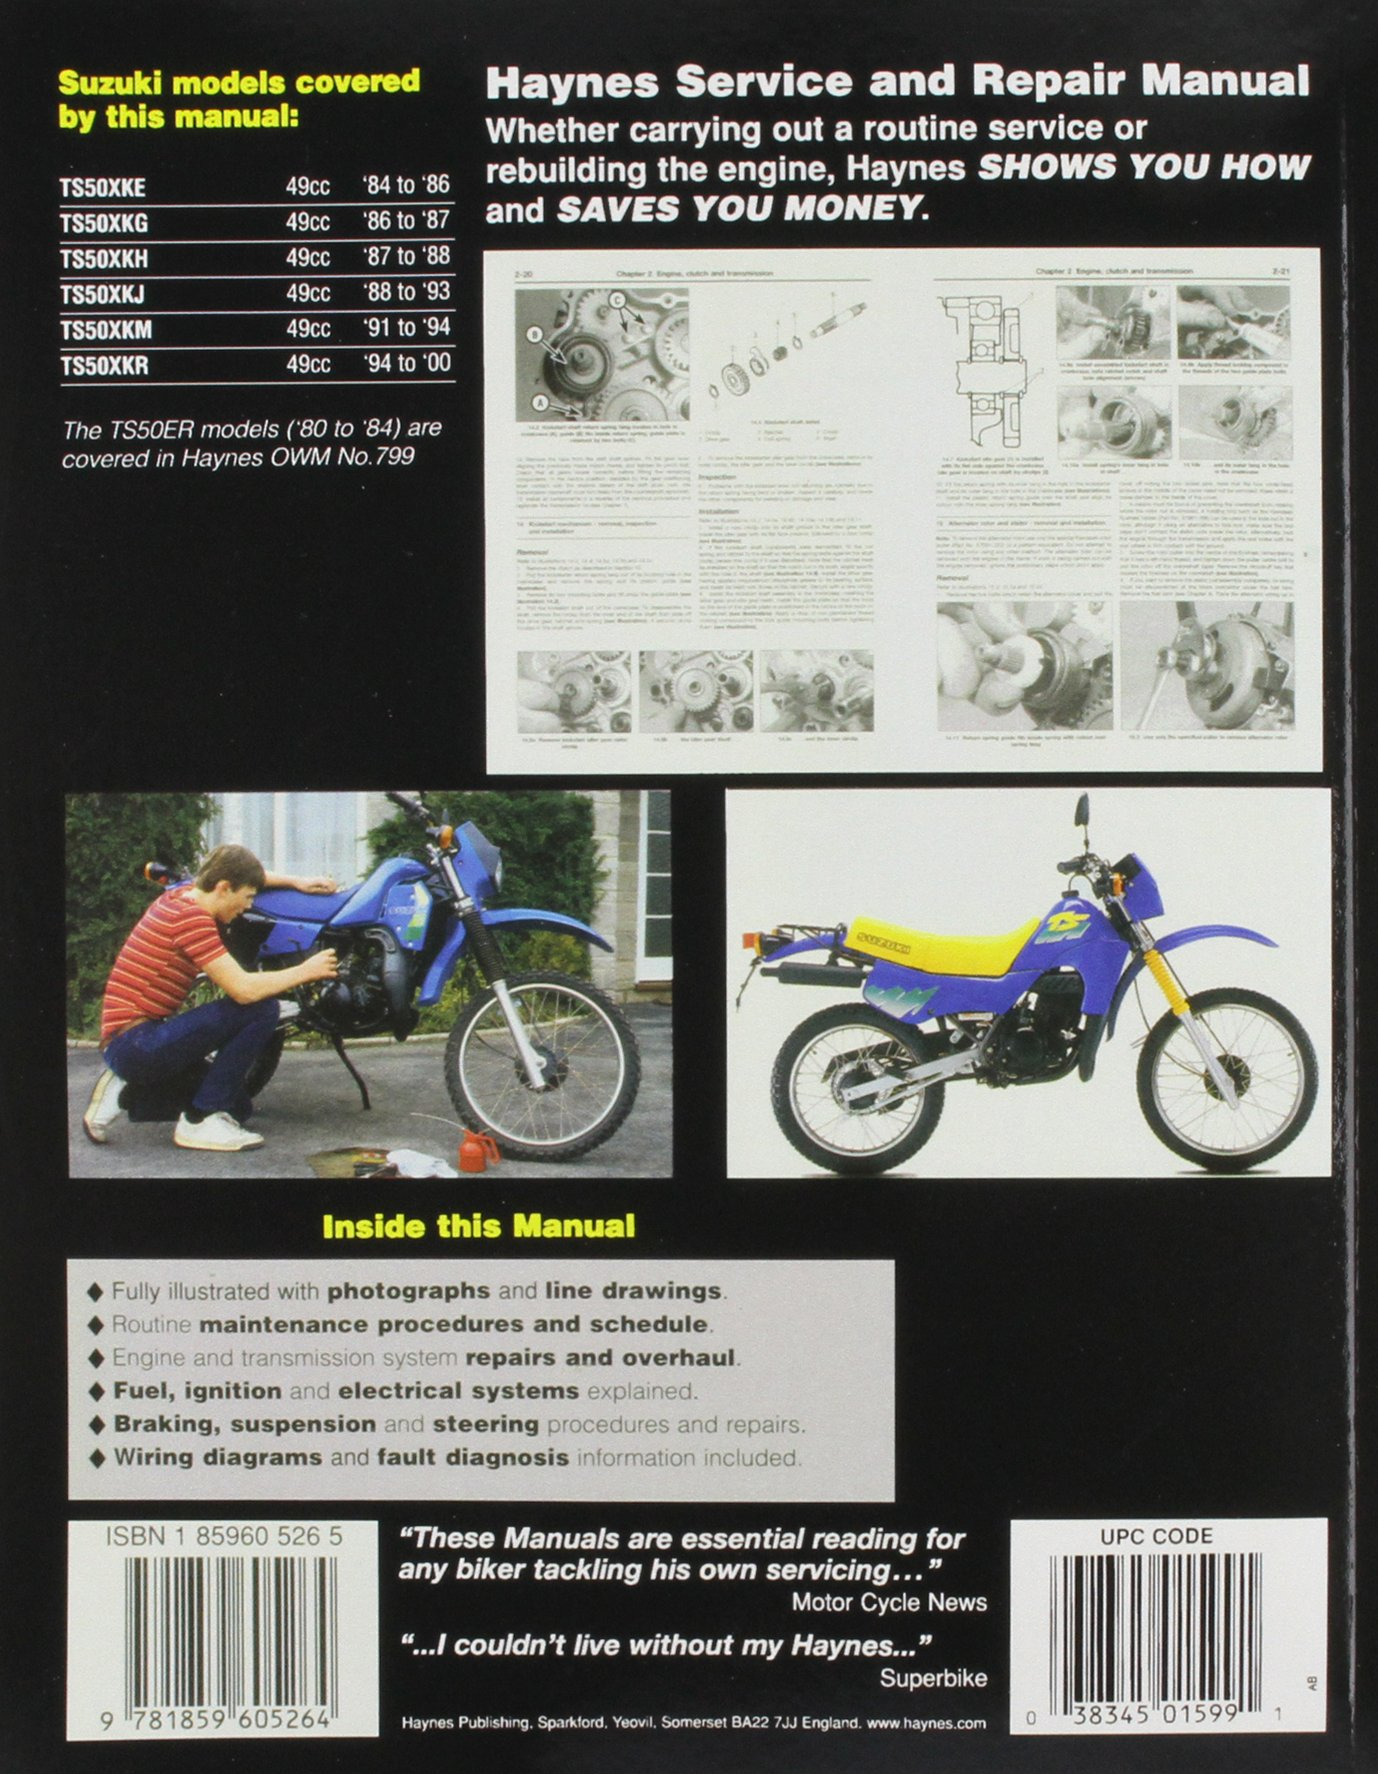 Suzuki TS 50X (1984-99) Service and Repair Manual (Haynes Service and Repair  Manuals): Richard Stone: 9781859605264: Amazon.com: Books